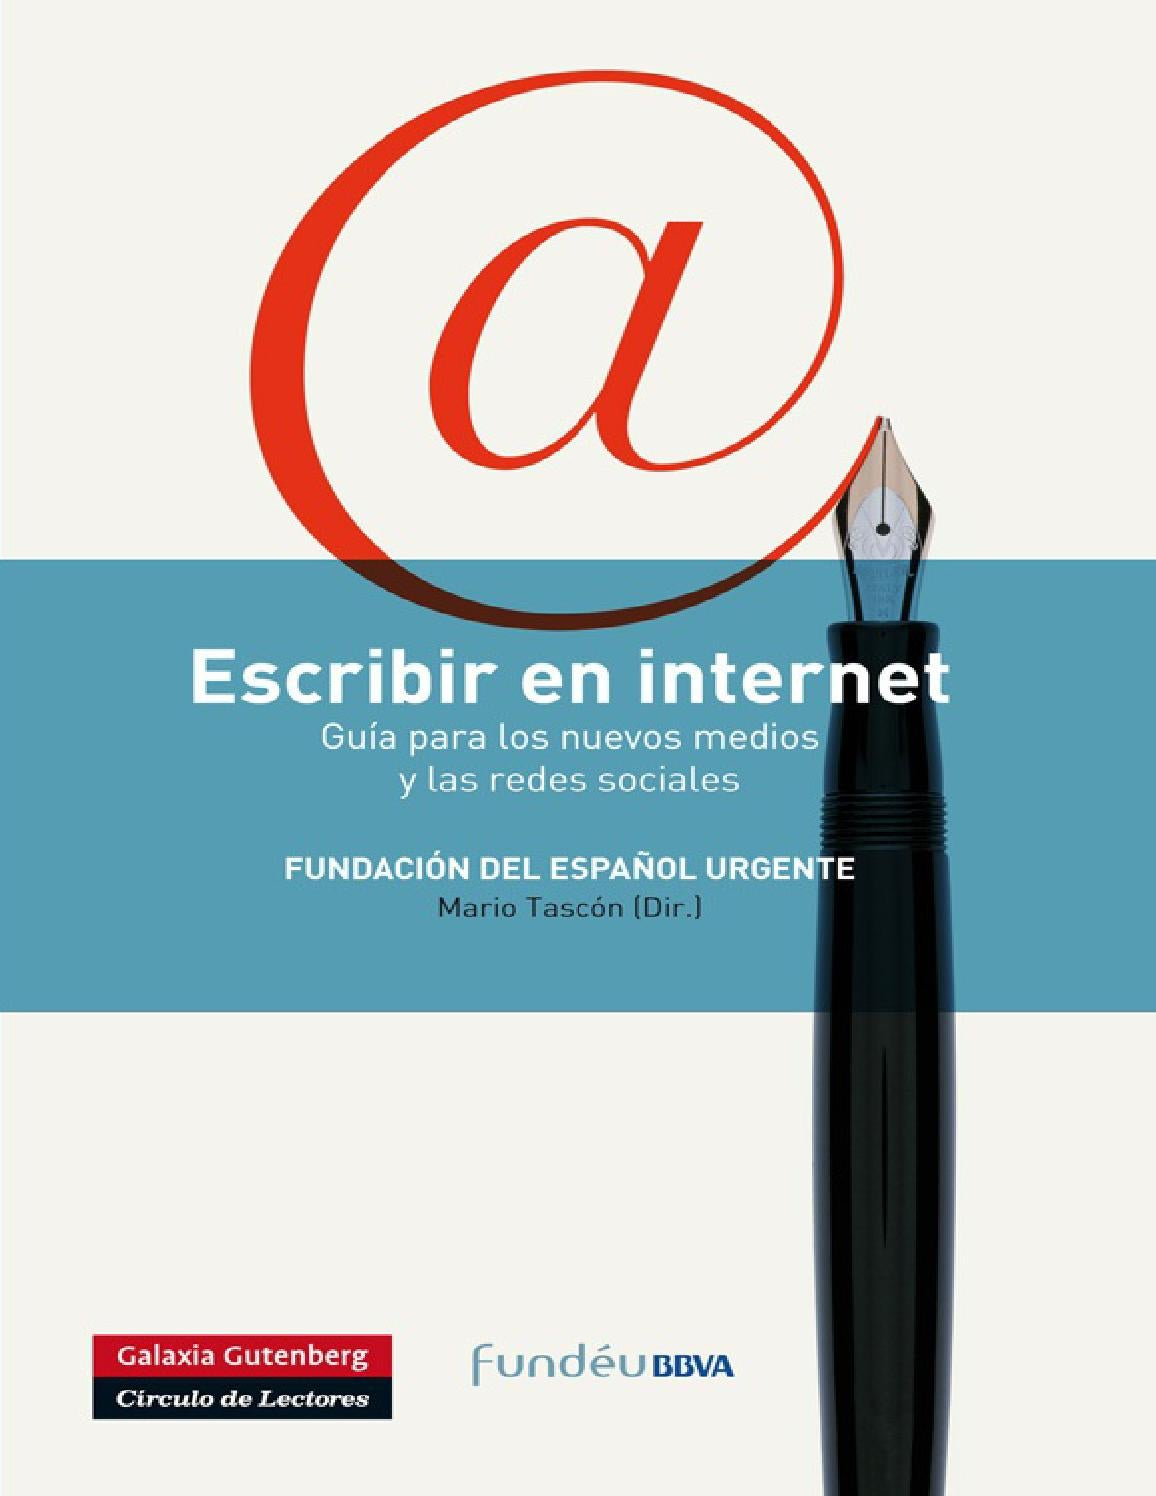 Escribir en internet (2012) Fundéu BBVA by Anselmo Lucio - issuu